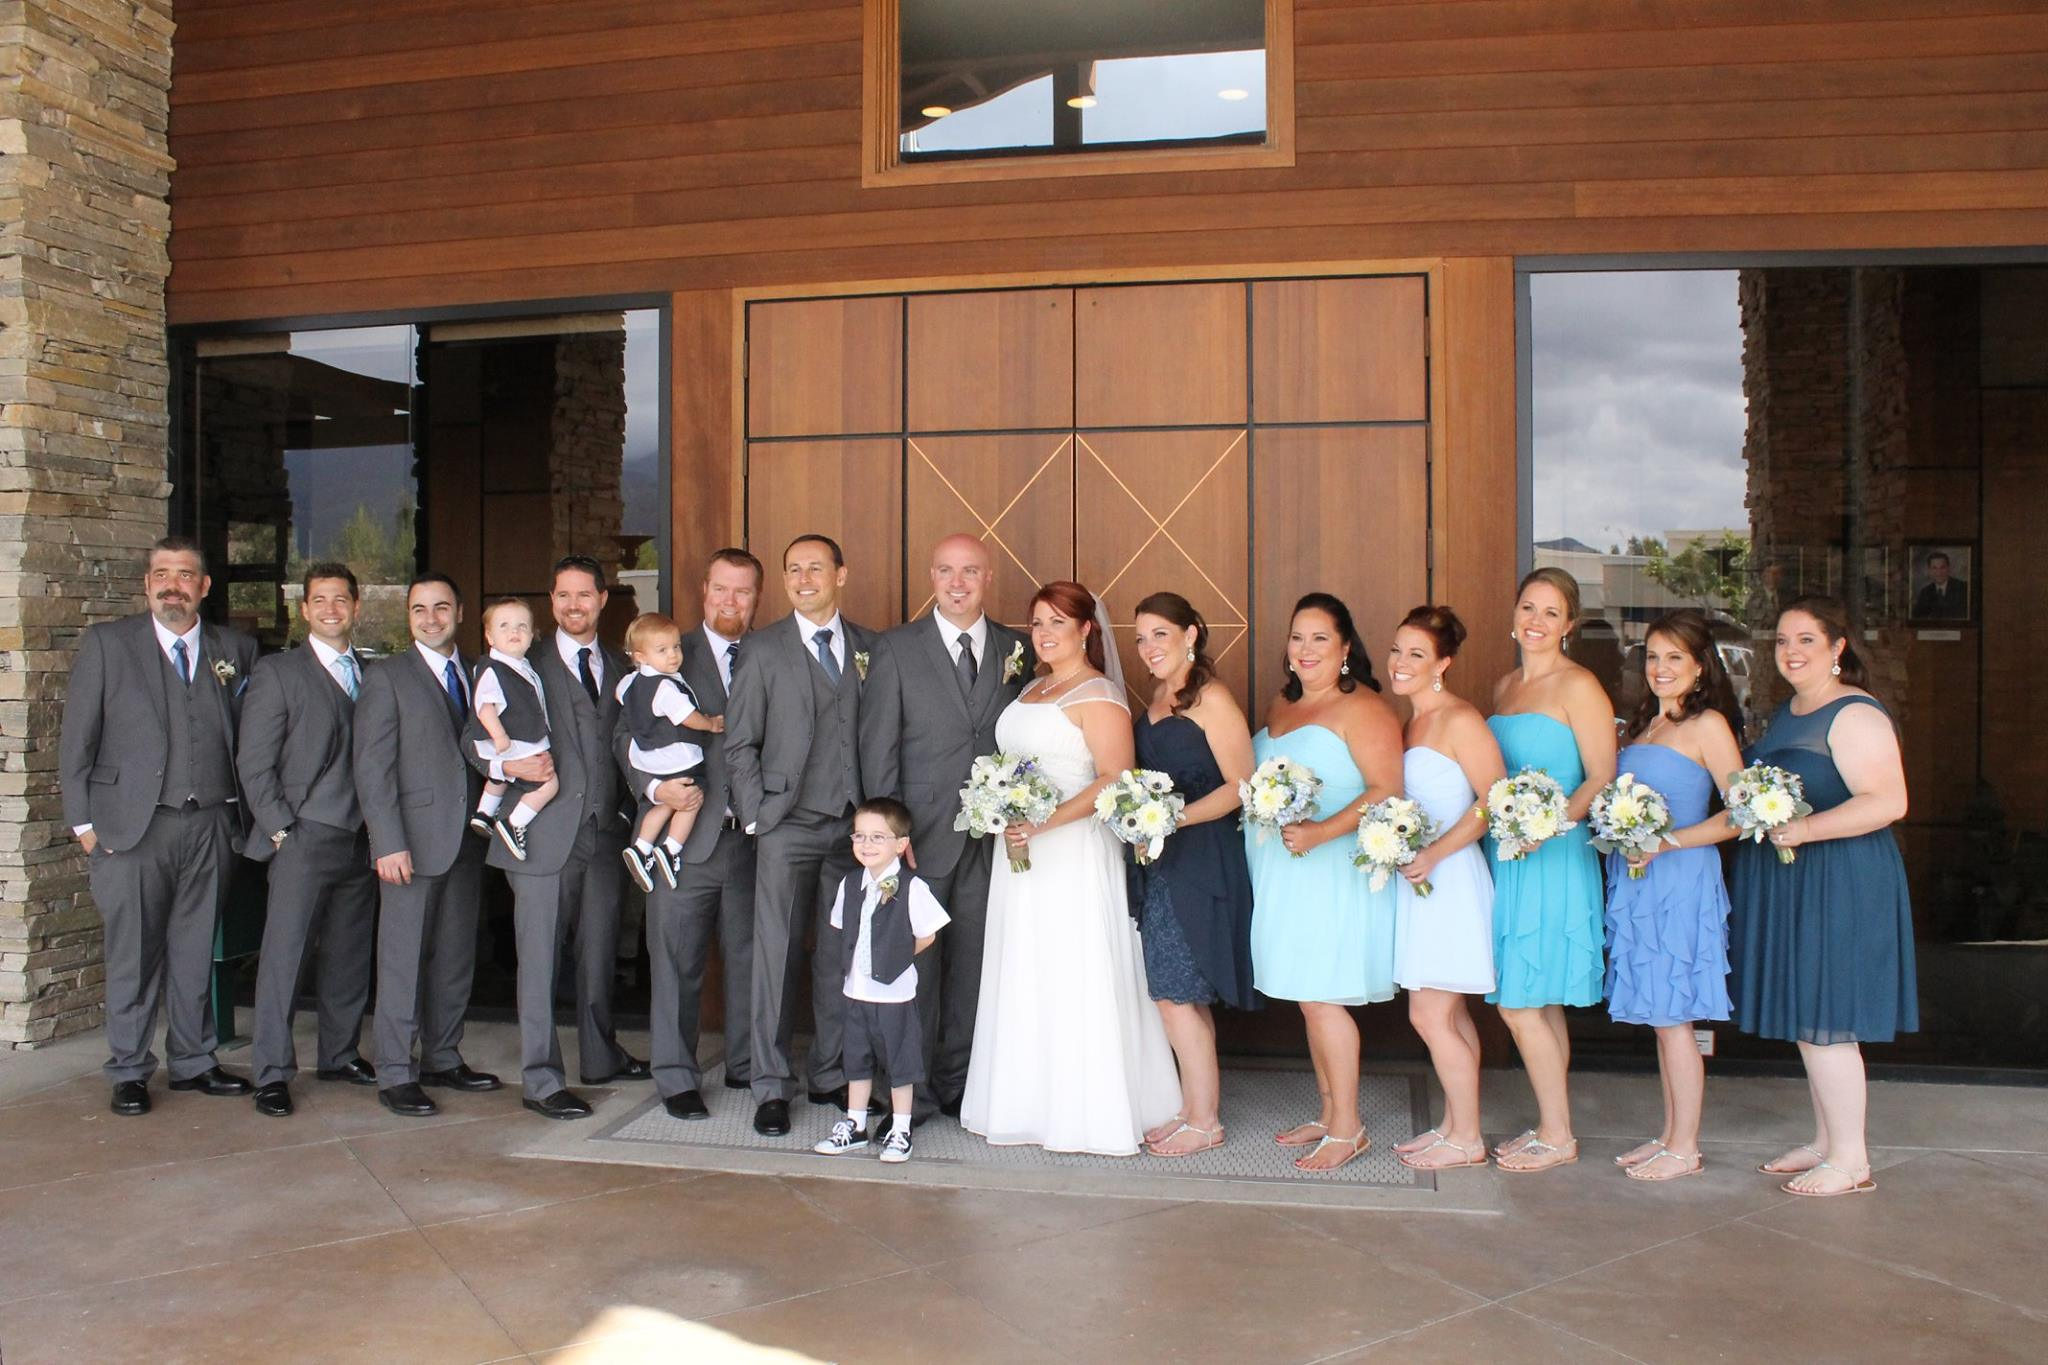 Bride groom groomsmen bridesmaids whites and blues